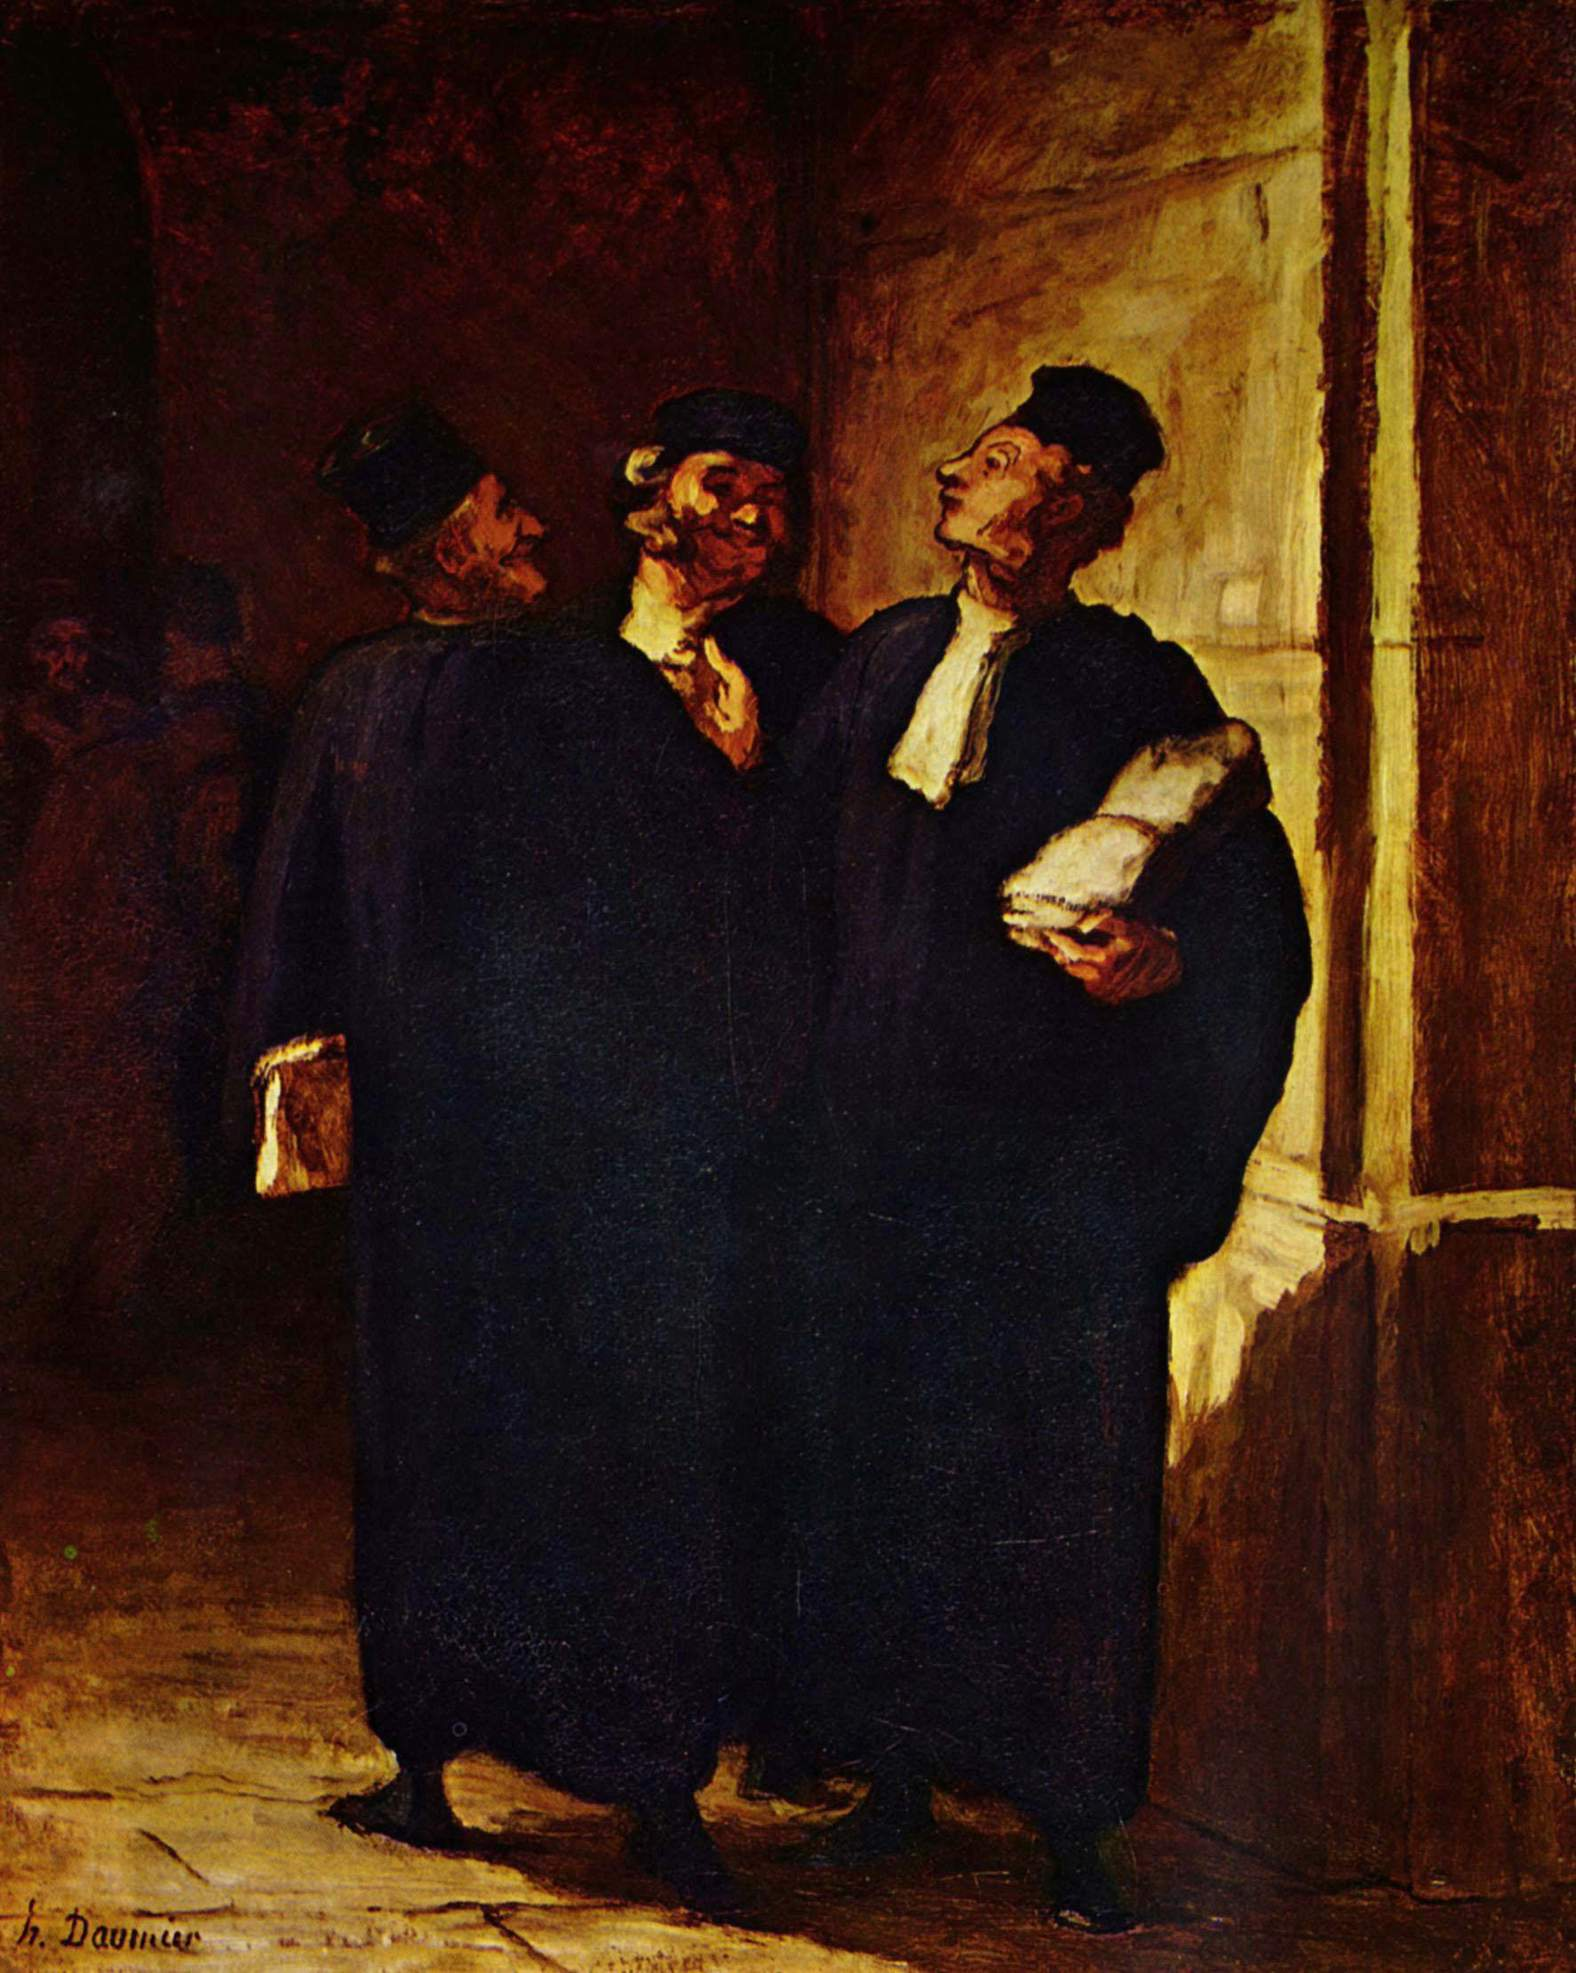 Honoré Daumier legal training solicitors